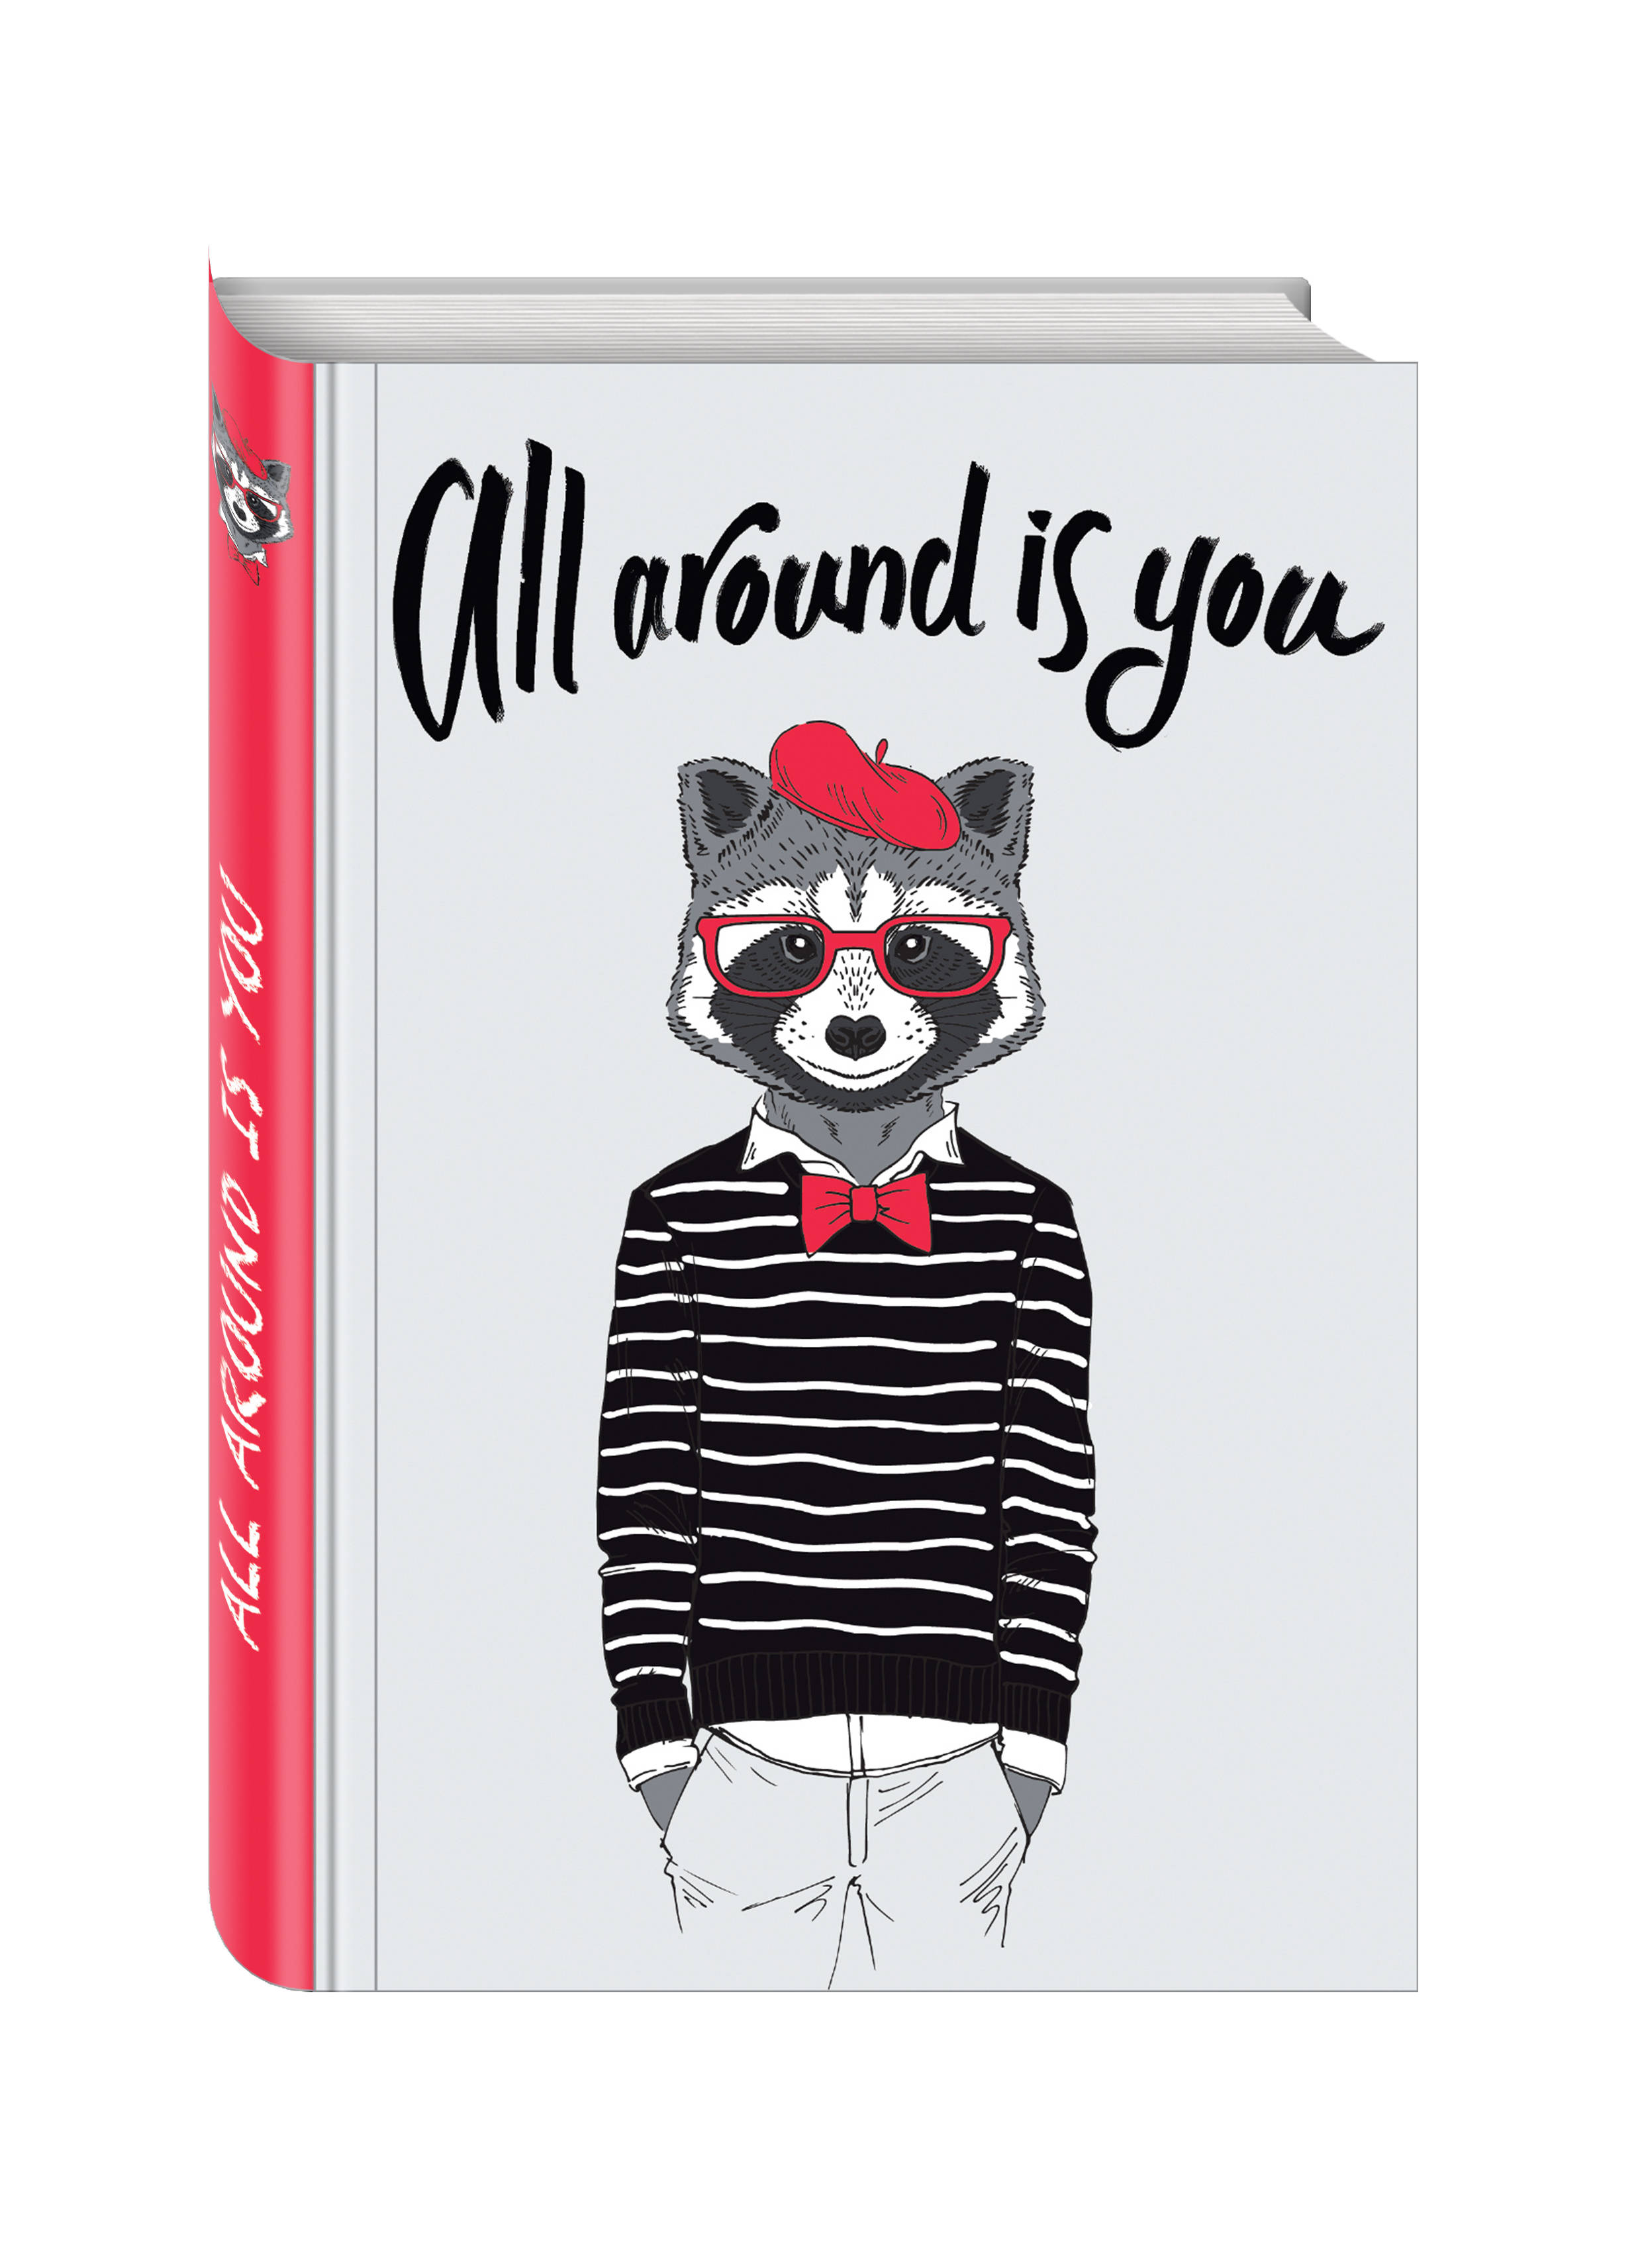 All around is you (Блокнот для хипстеров) (твердый переплет, 136х206 мм) антихайп красный блокнот твердый переплет 160x243